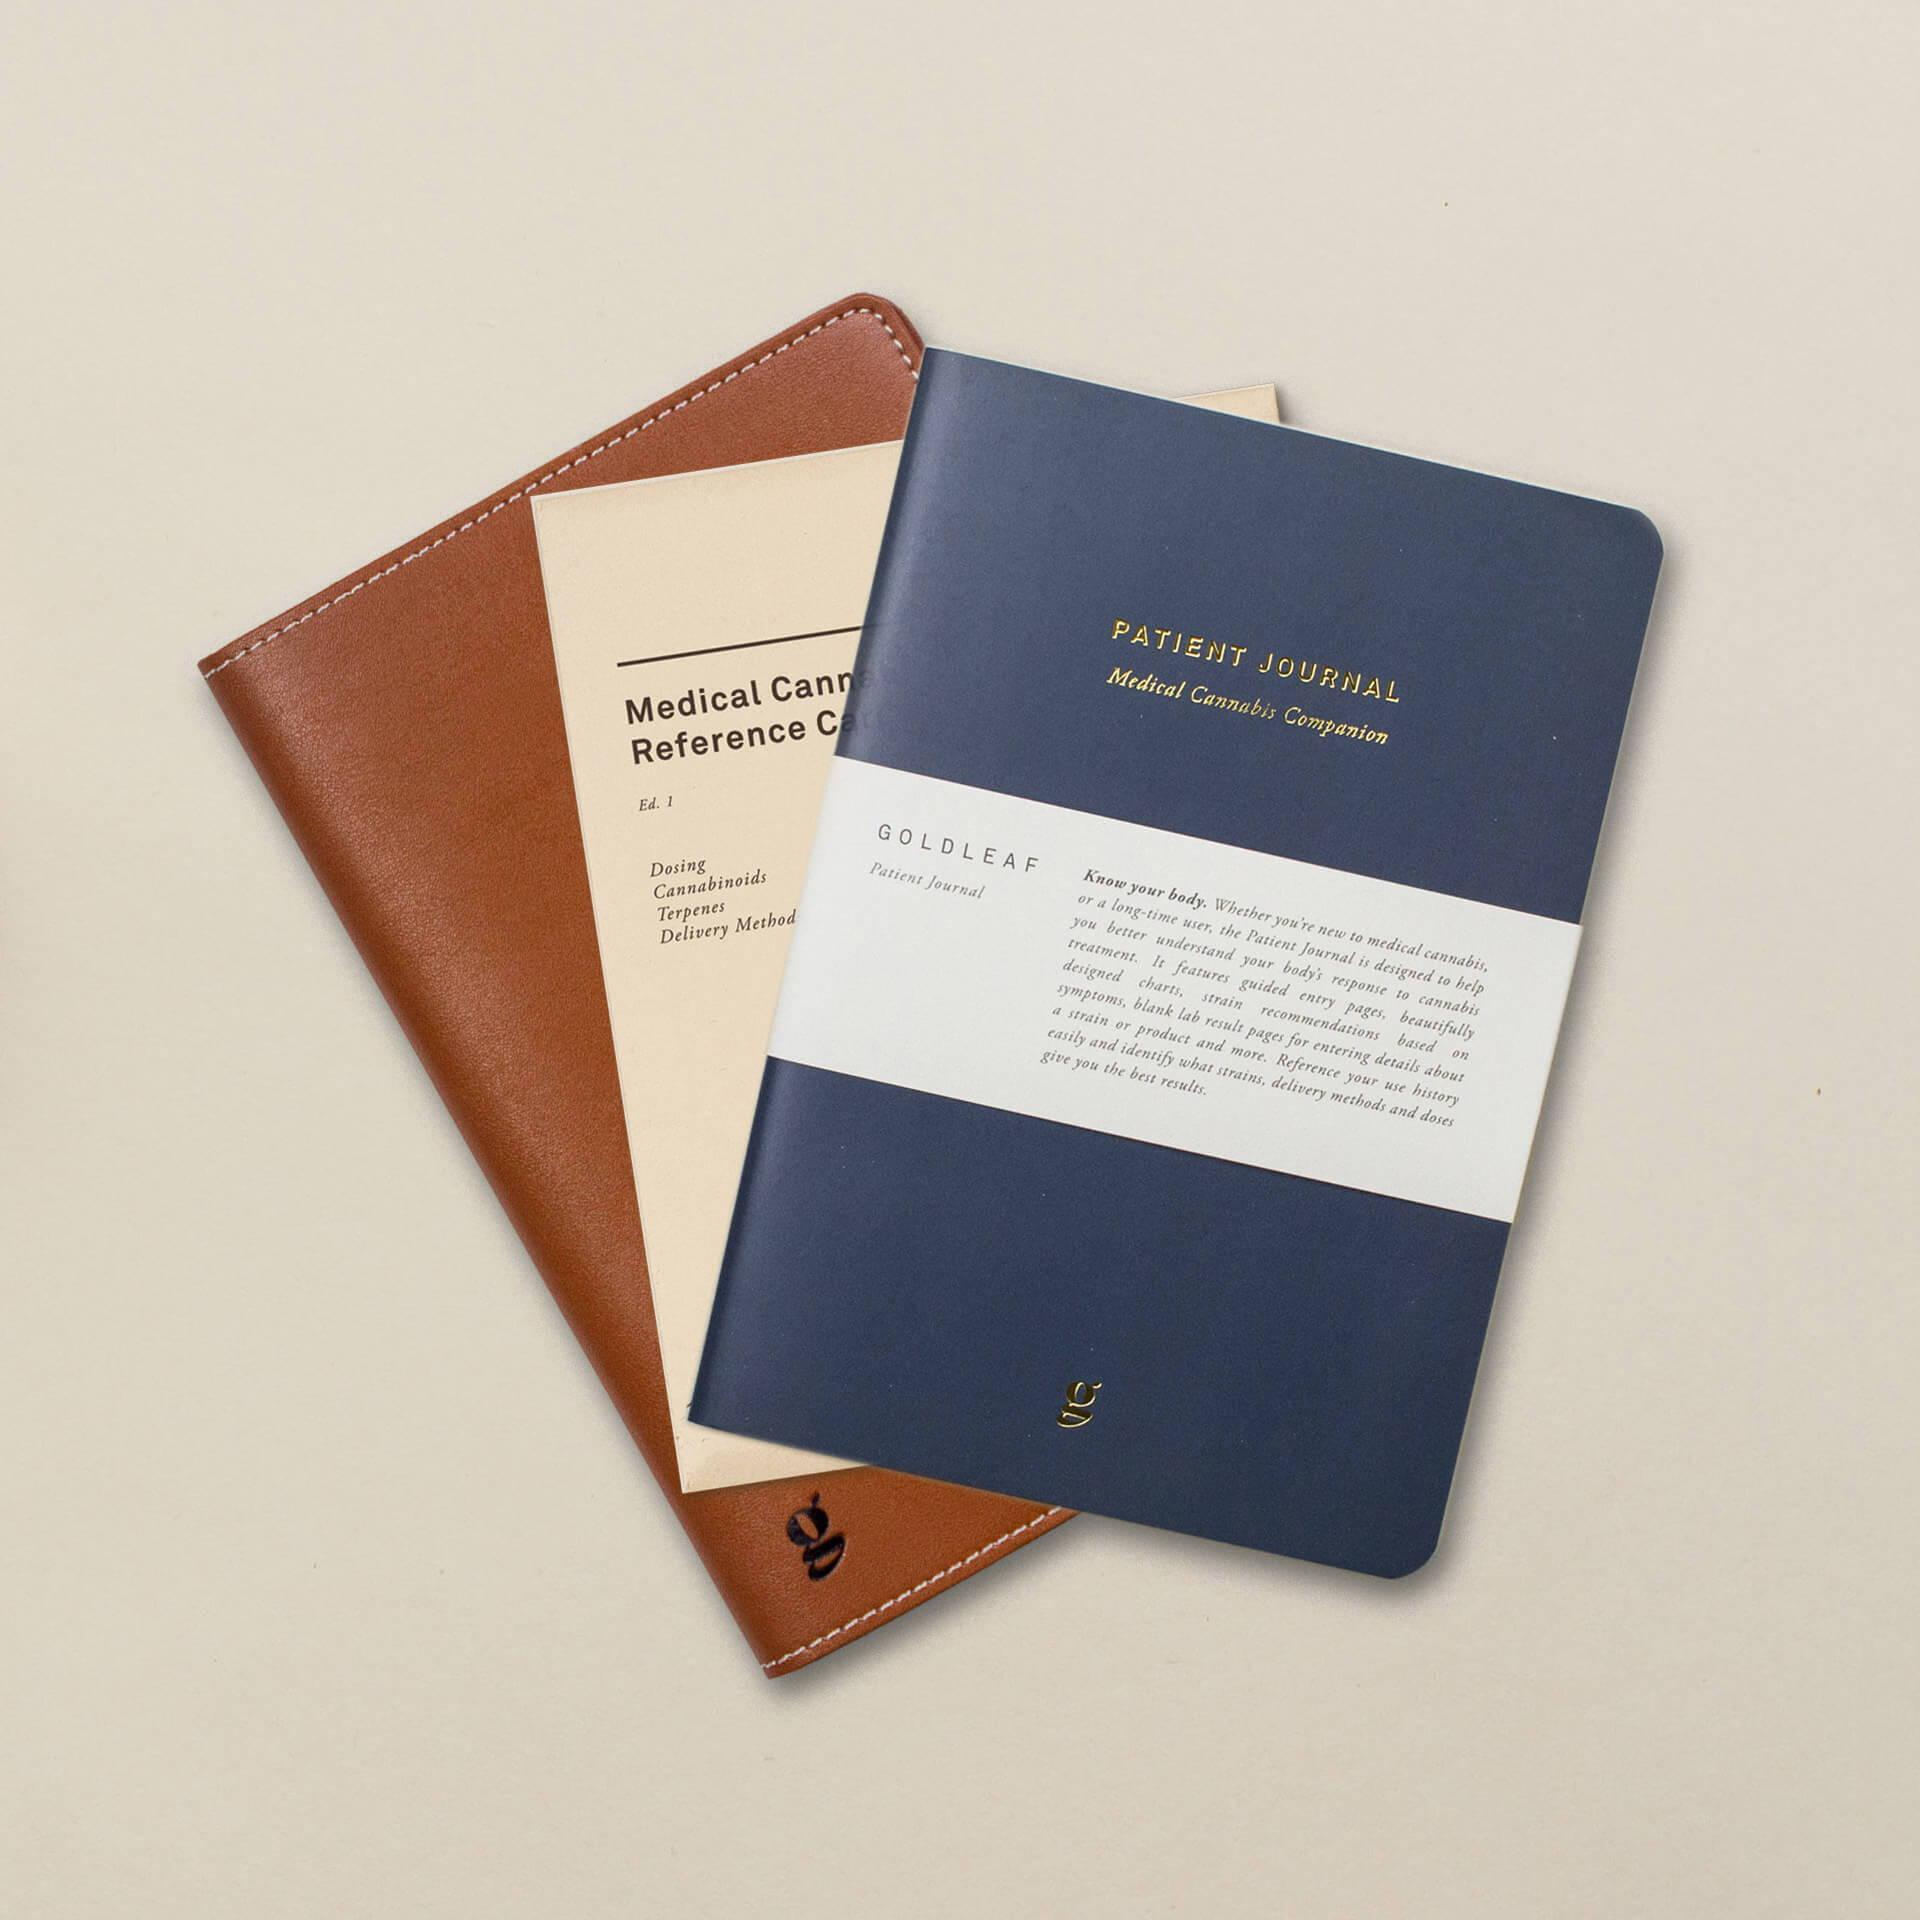 Goldleaf Patient Journal Bundle